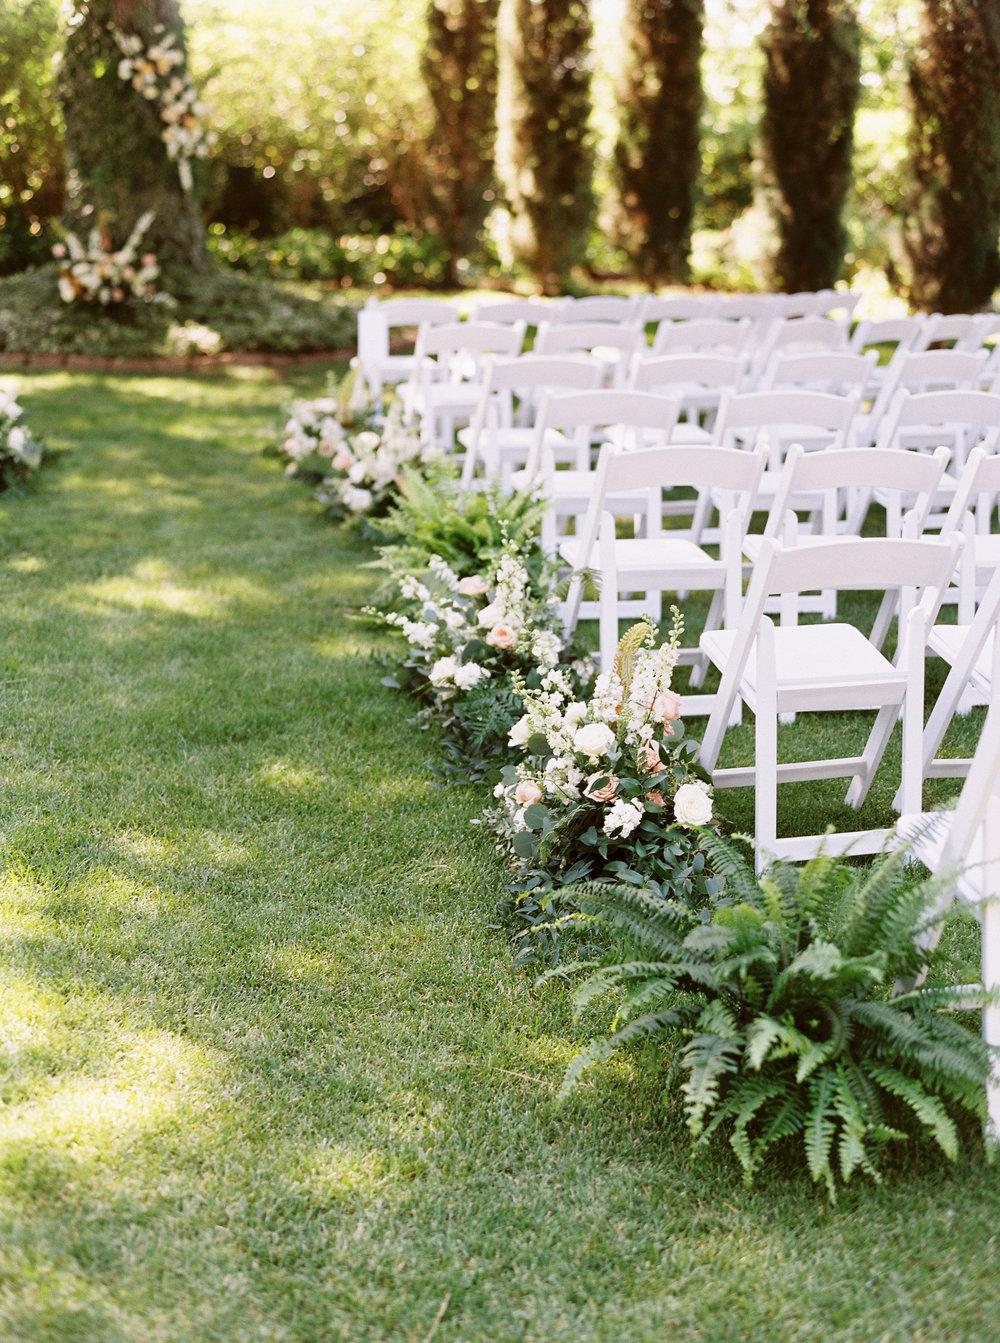 Durst-winery-wedding-in-lodi-calfornia-65.jpg